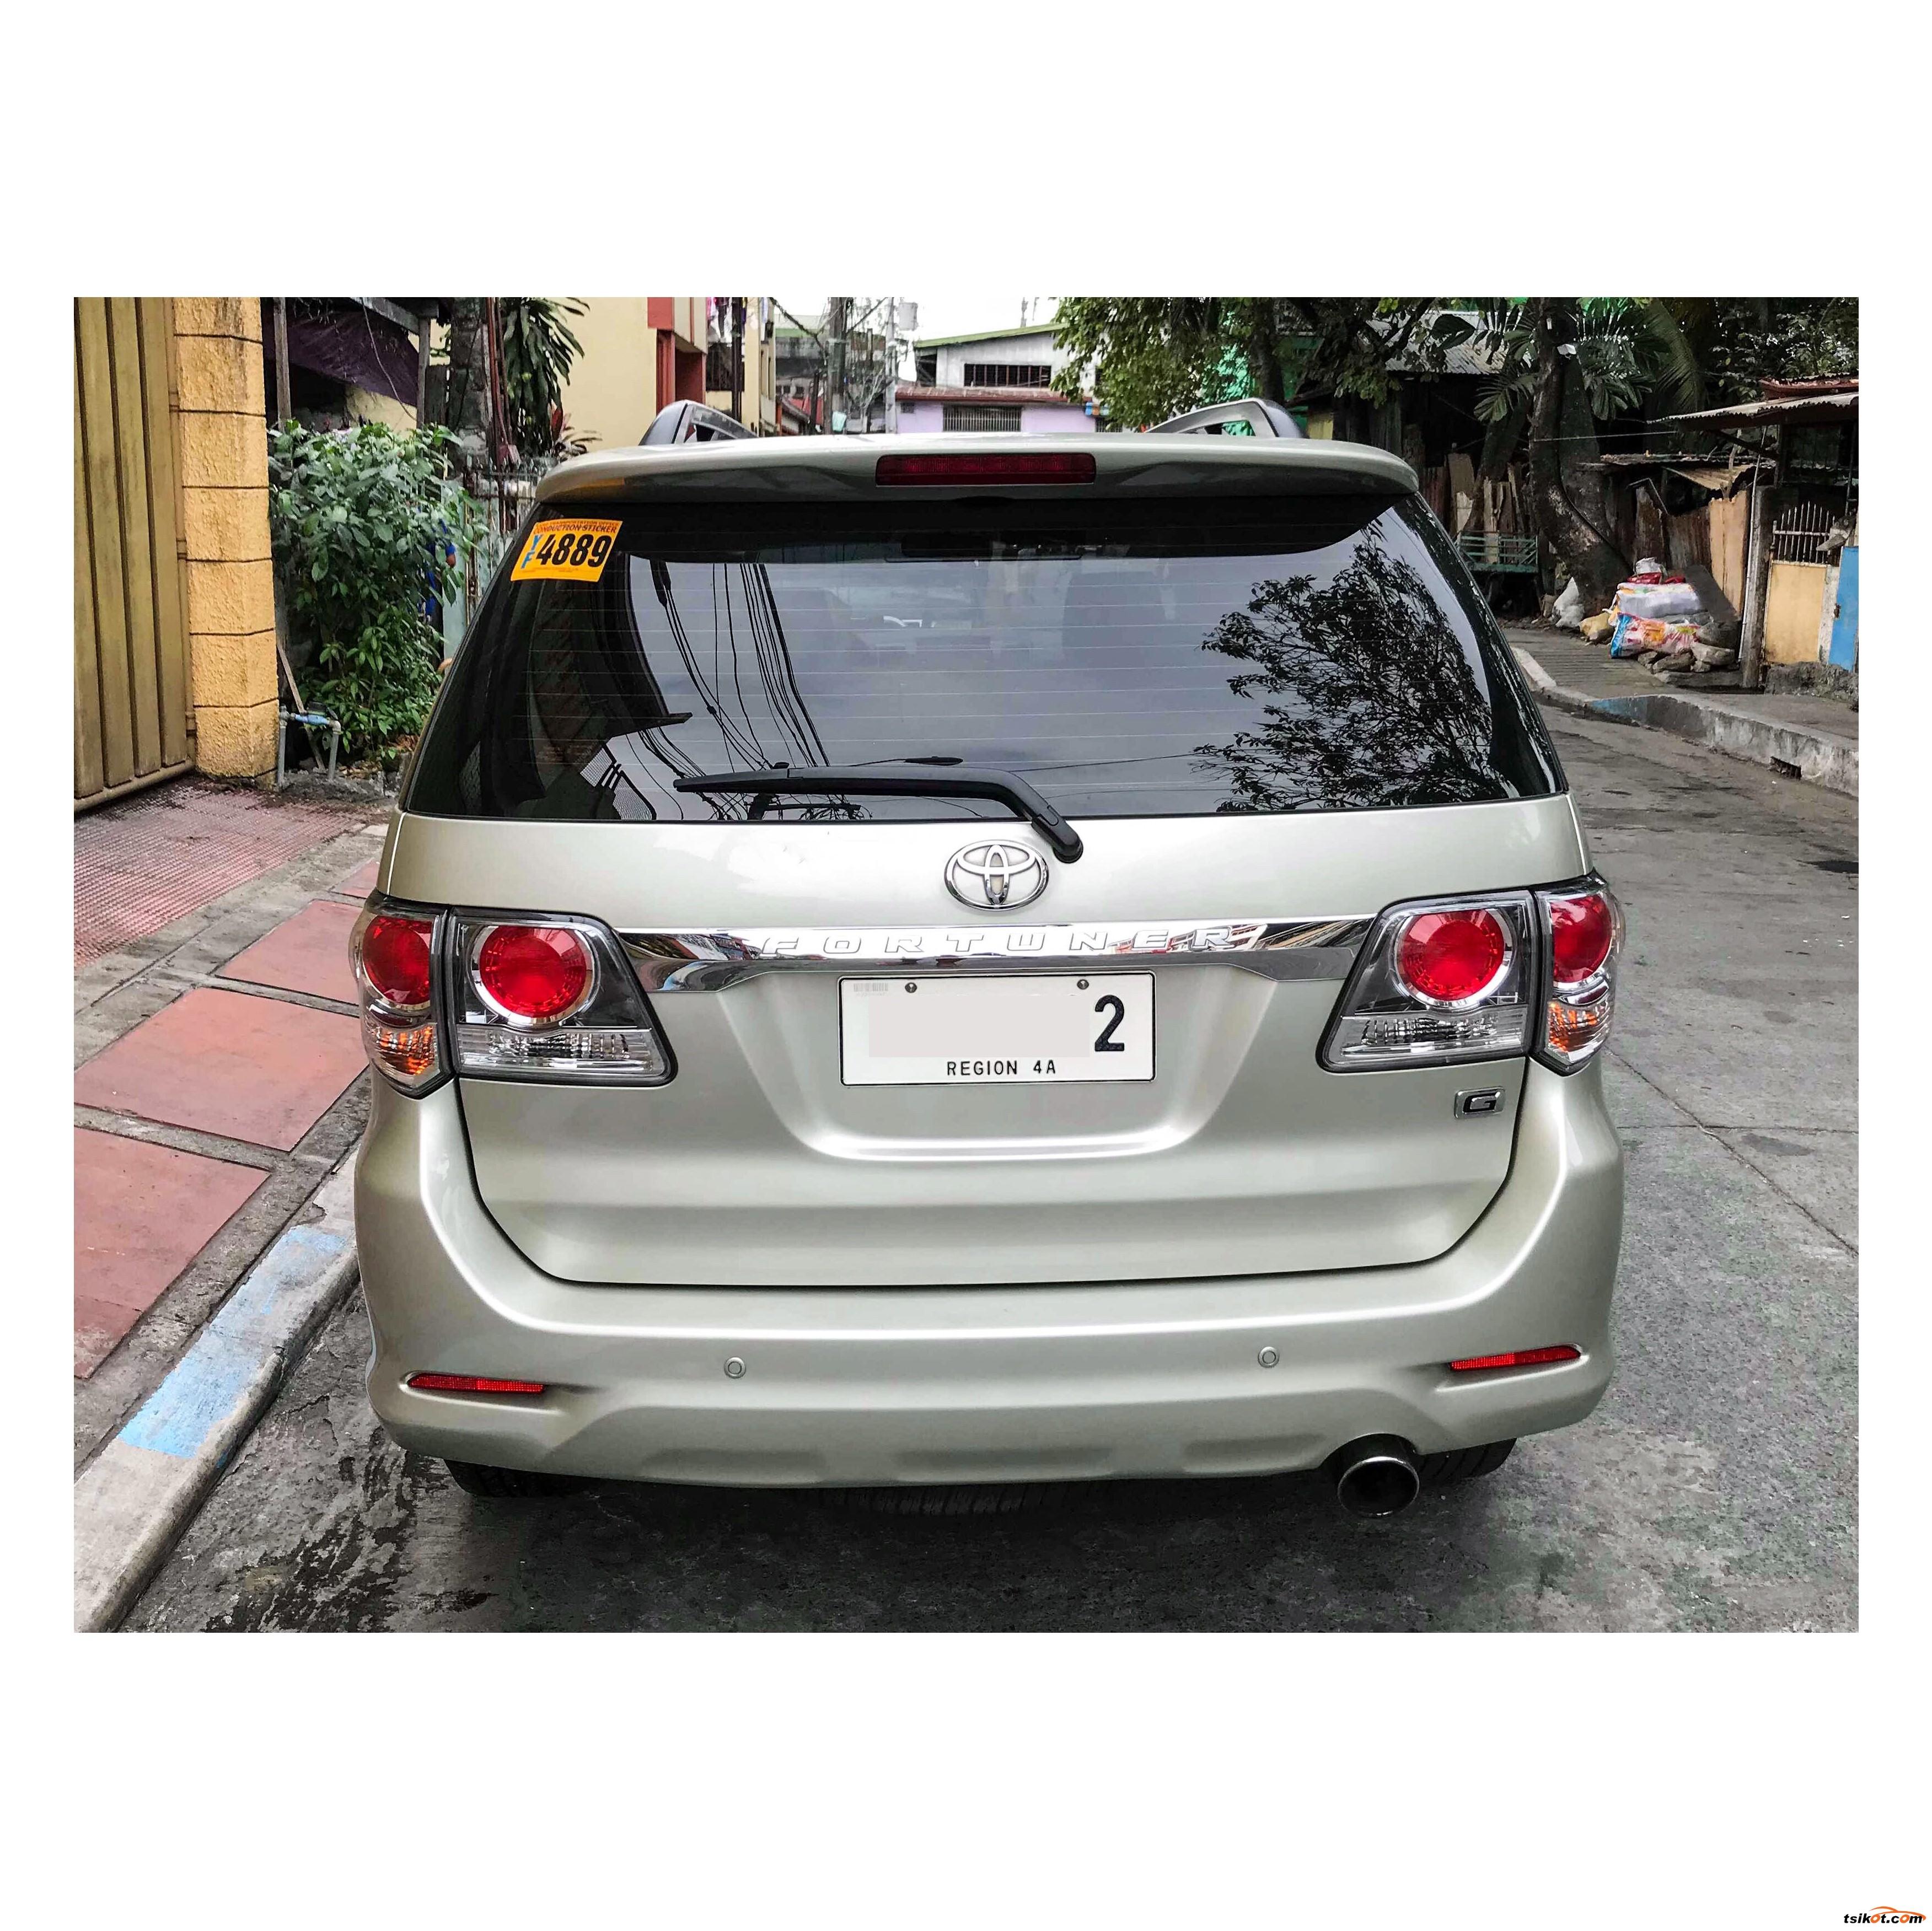 Used Mitsubishi Pajero Sport Manual In Bangalore 2014: Car For Sale Metro Manila